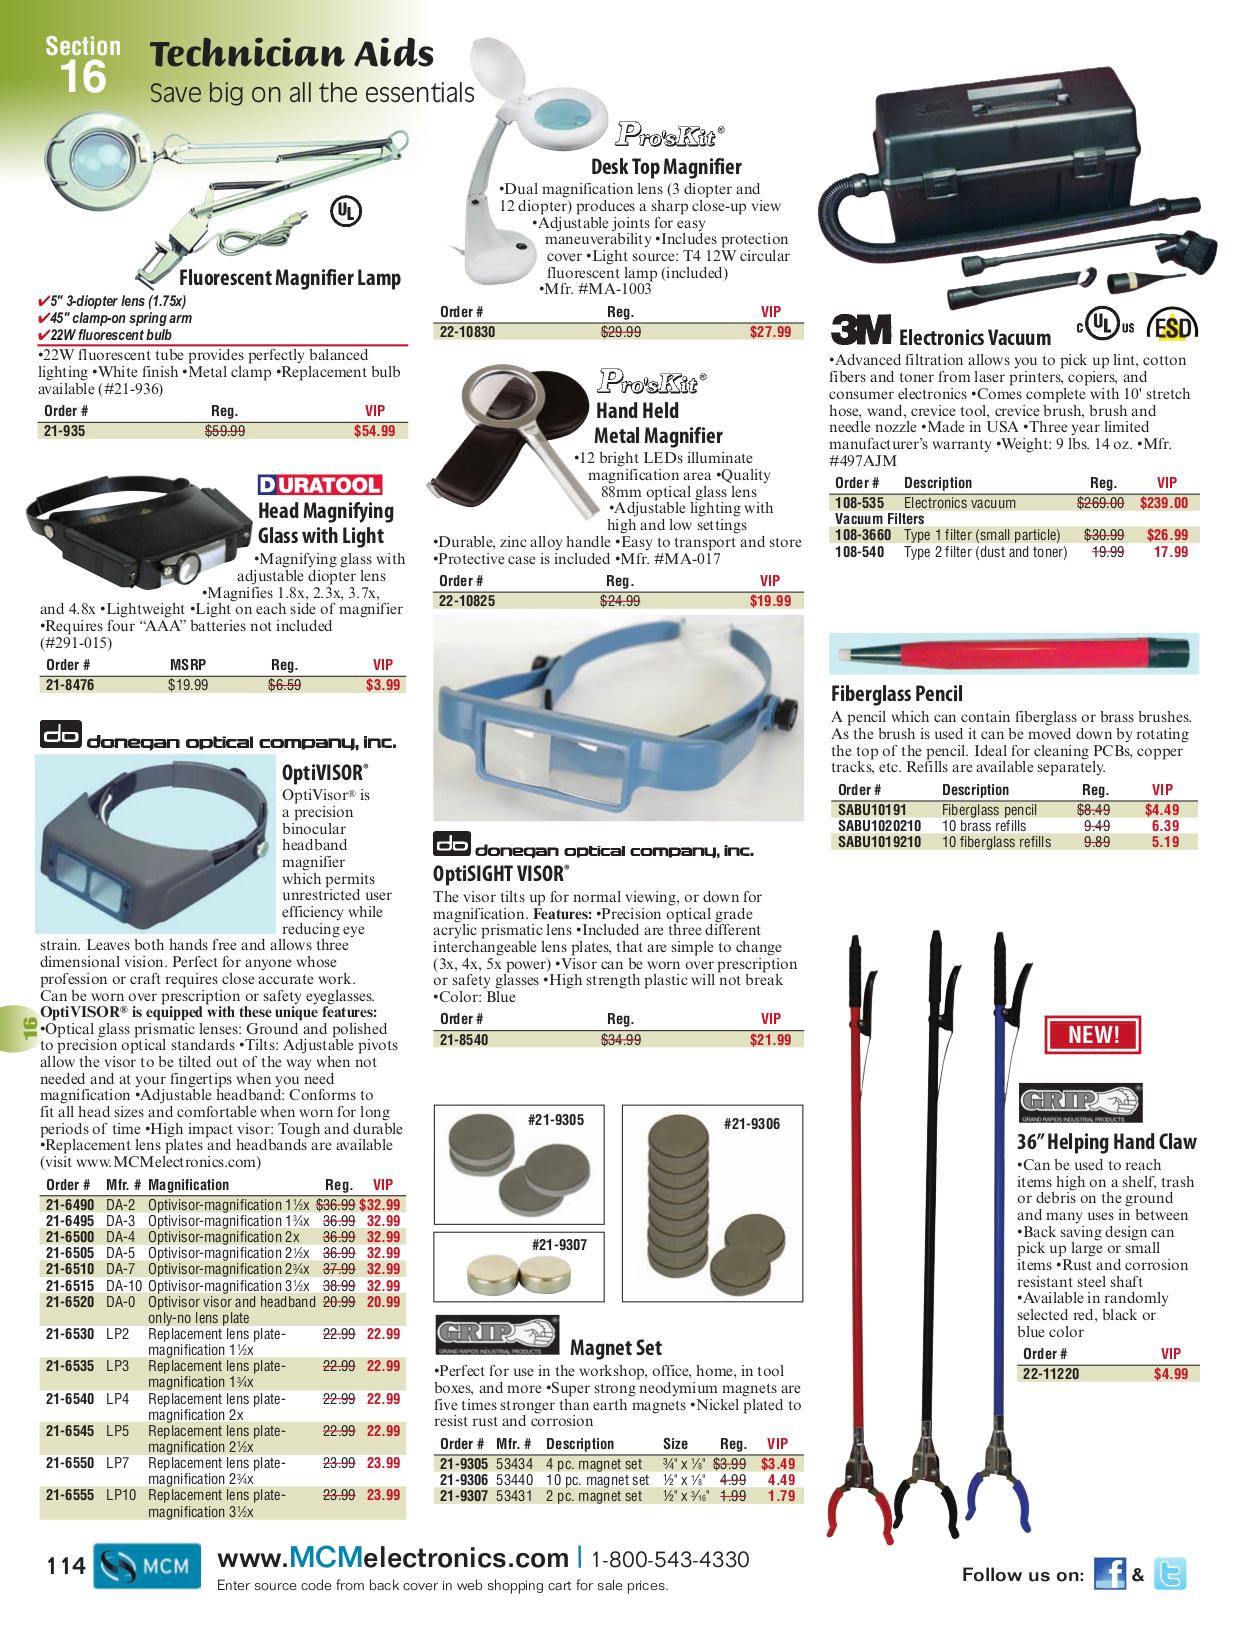 pdf manual for toshiba dvd players sd 2815 rh umlib com Toshiba TV Owners Manual Toshiba Instruction Manual